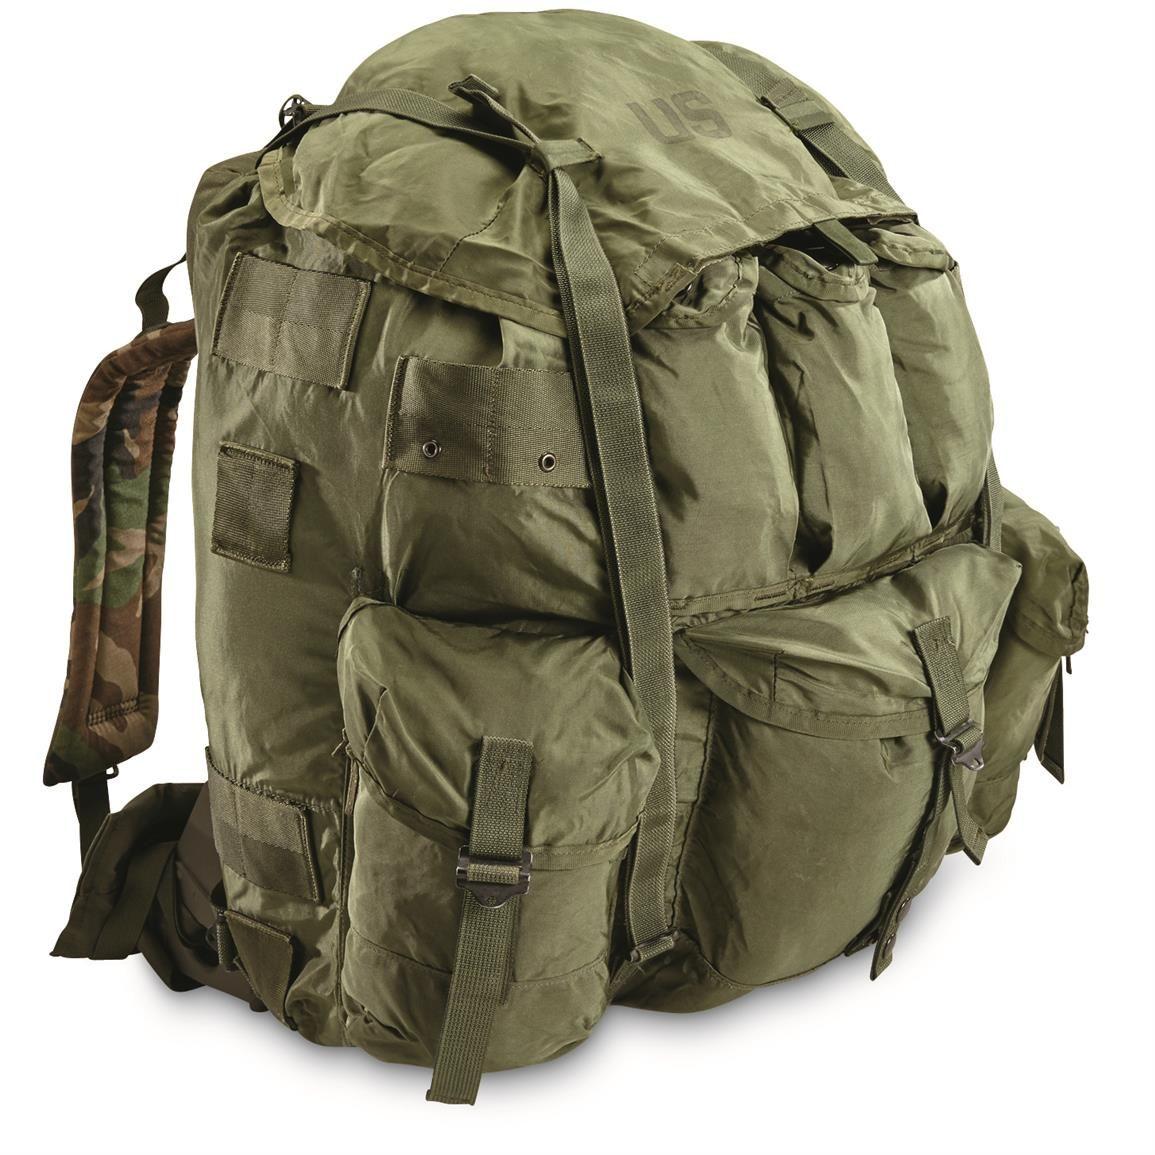 U S Military Surplus A L I C E Pack With Metal Frame Used Military Surplus Military Military Gear